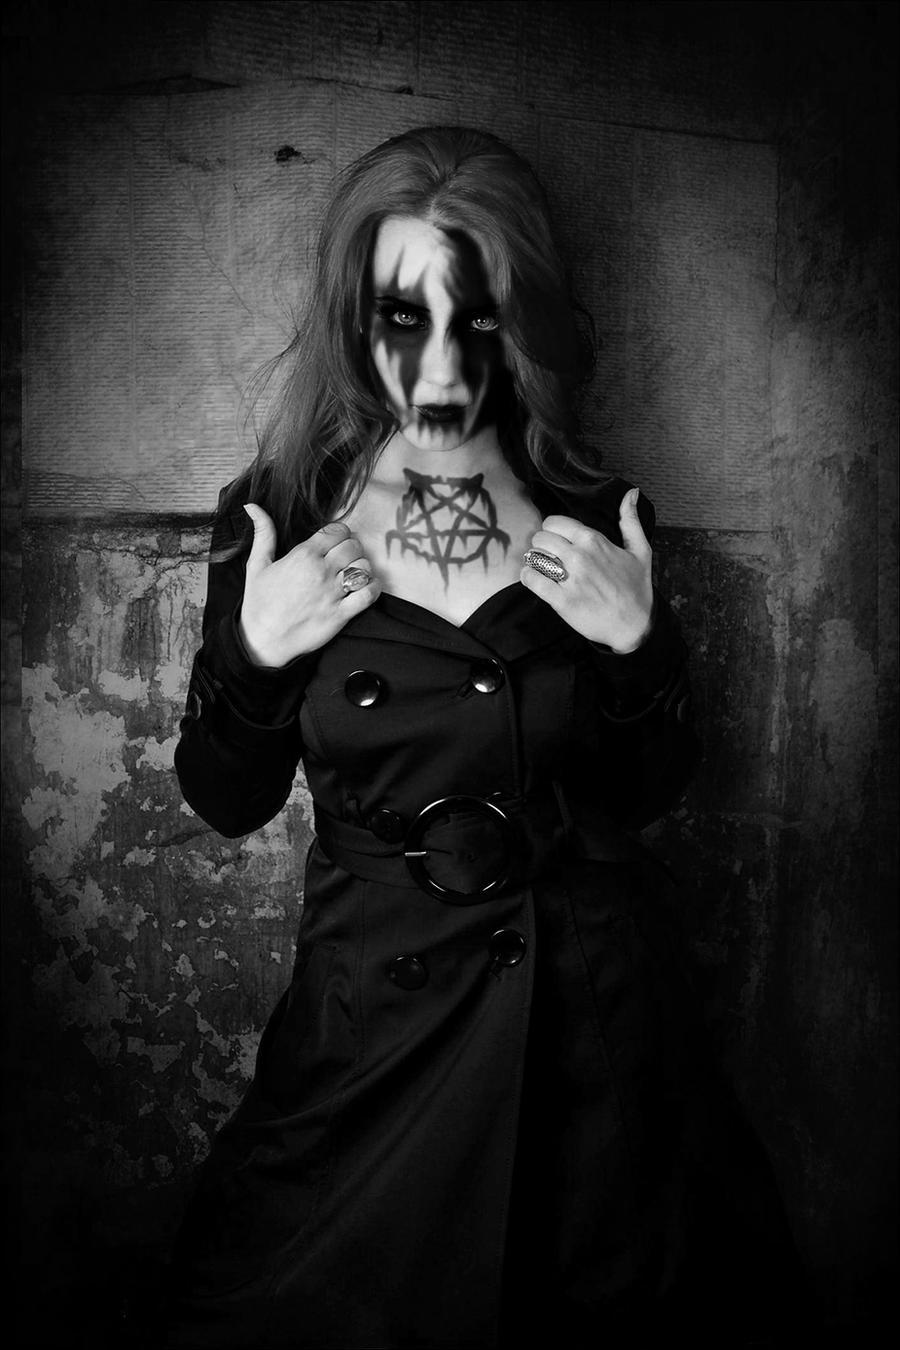 Black metal naked girls pics you